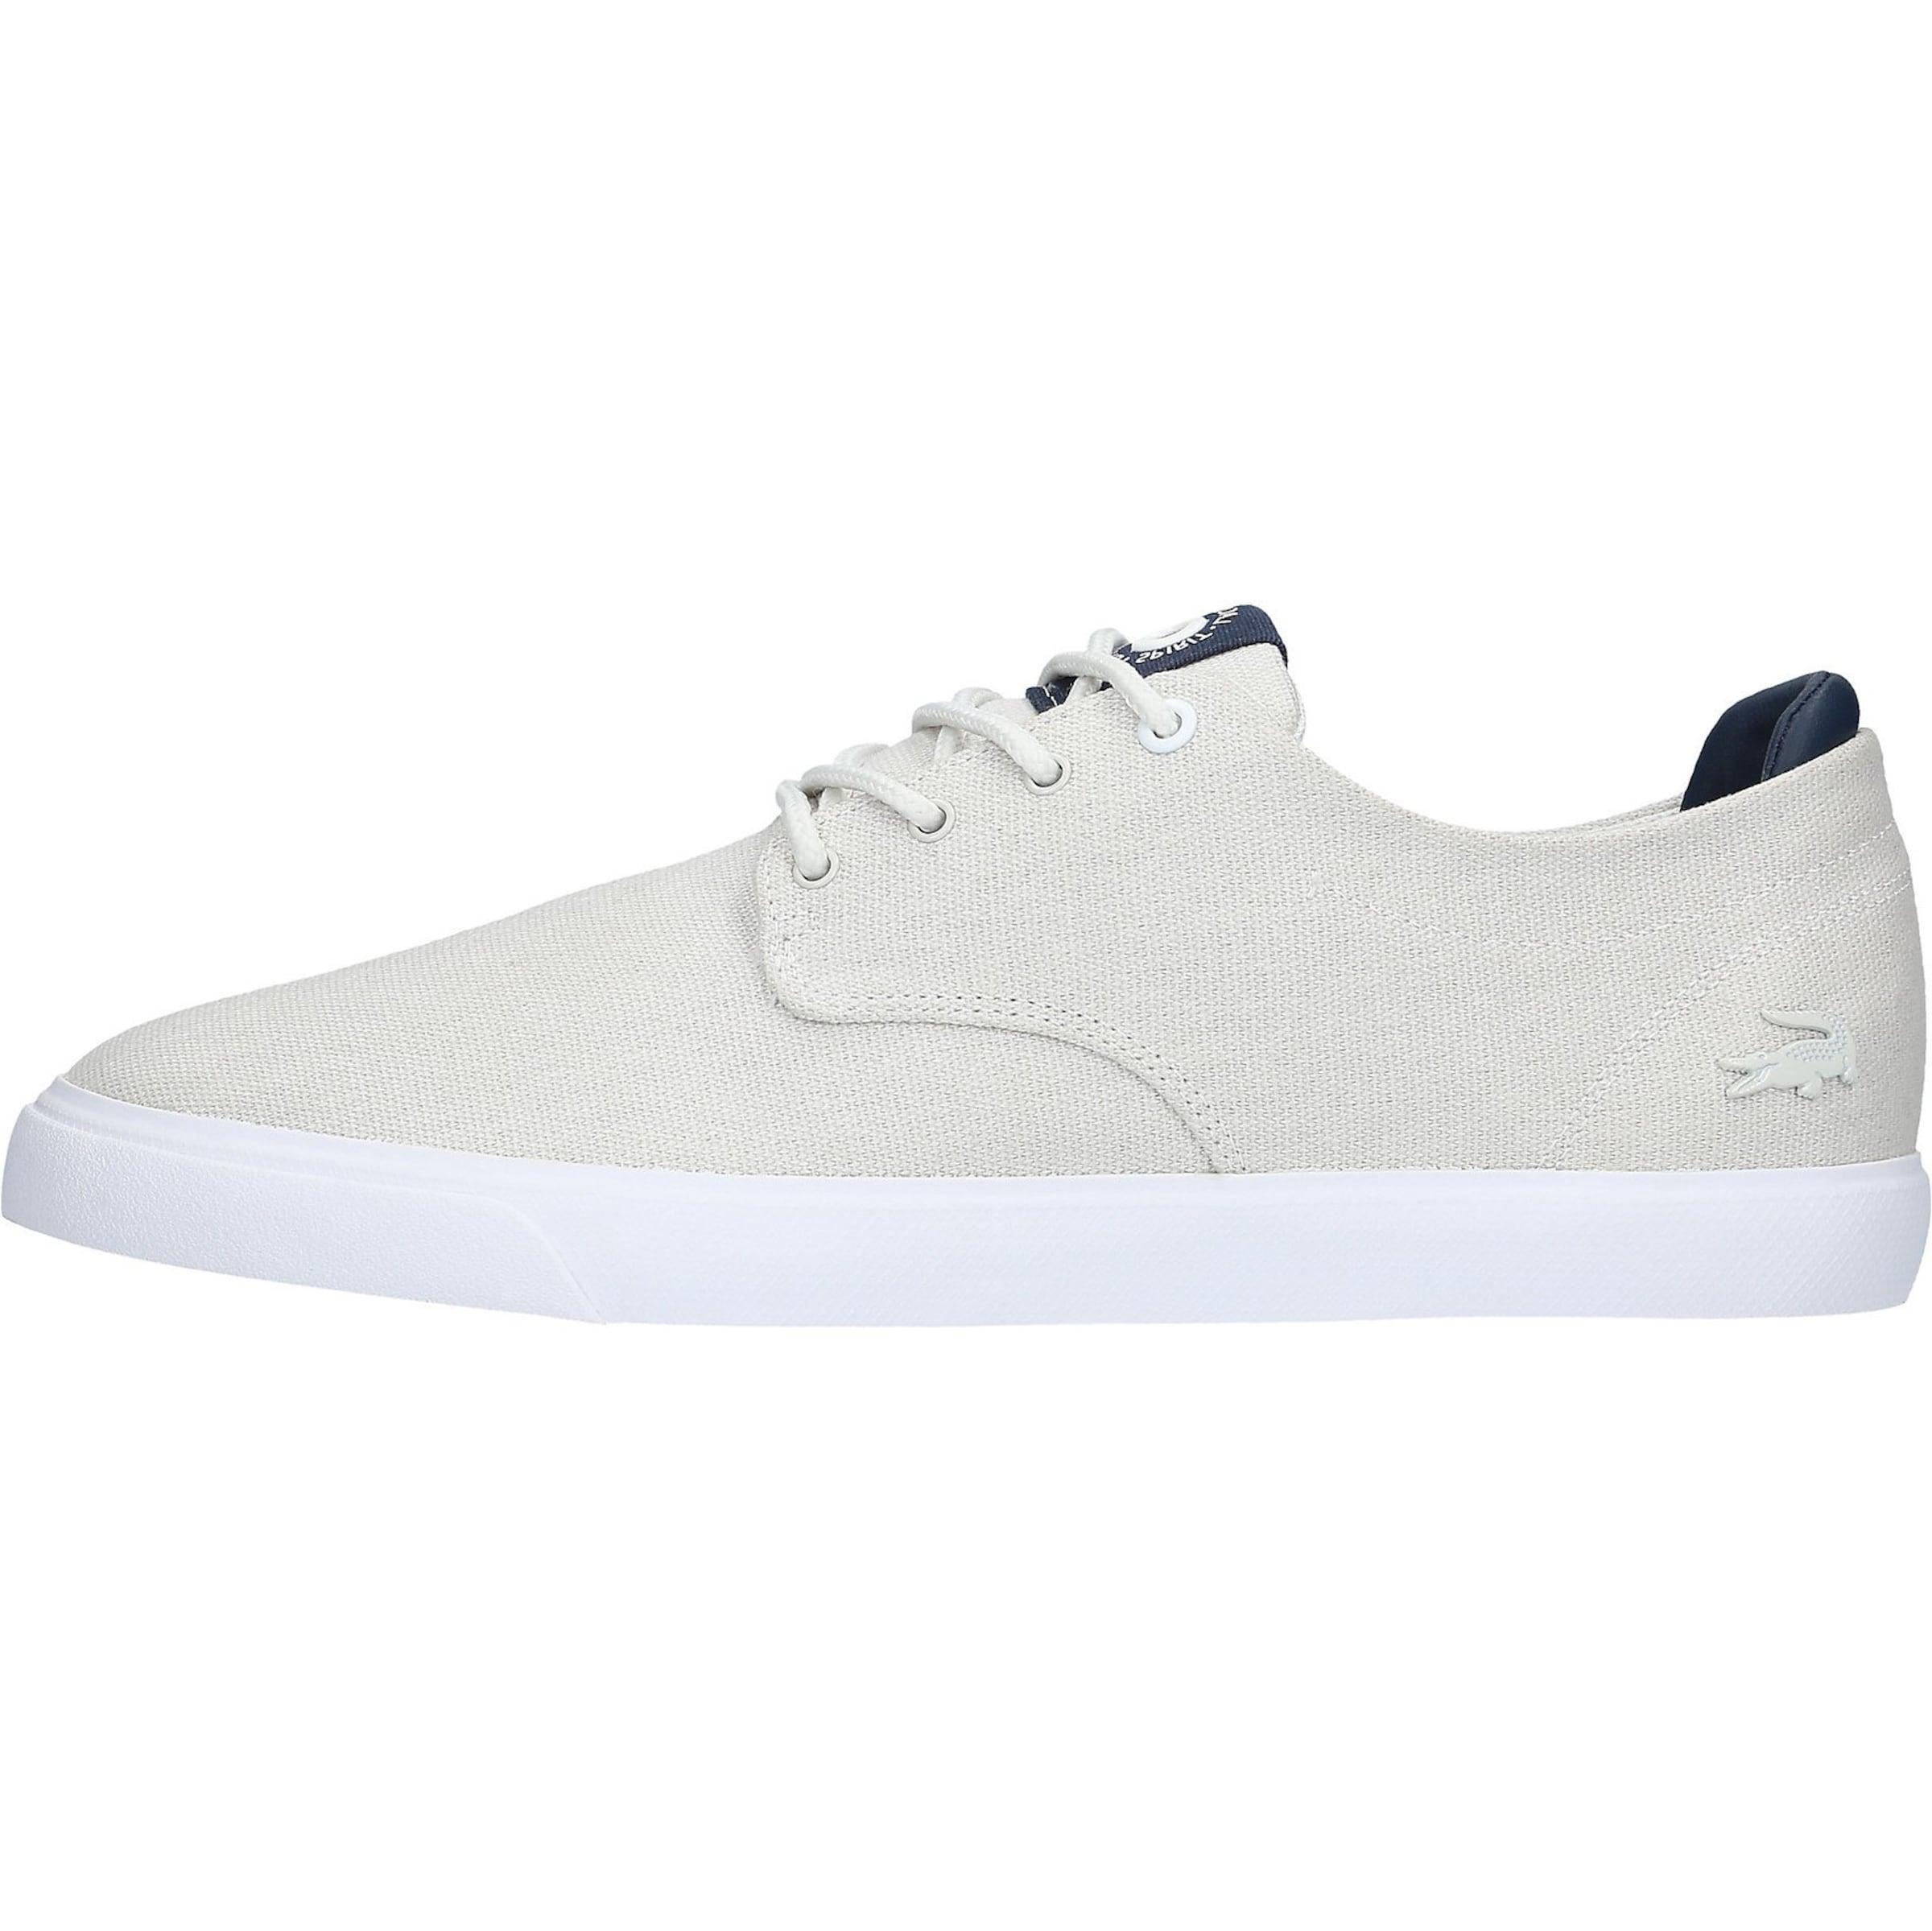 LACOSTE Esparre 118 2 Cam Sneakers